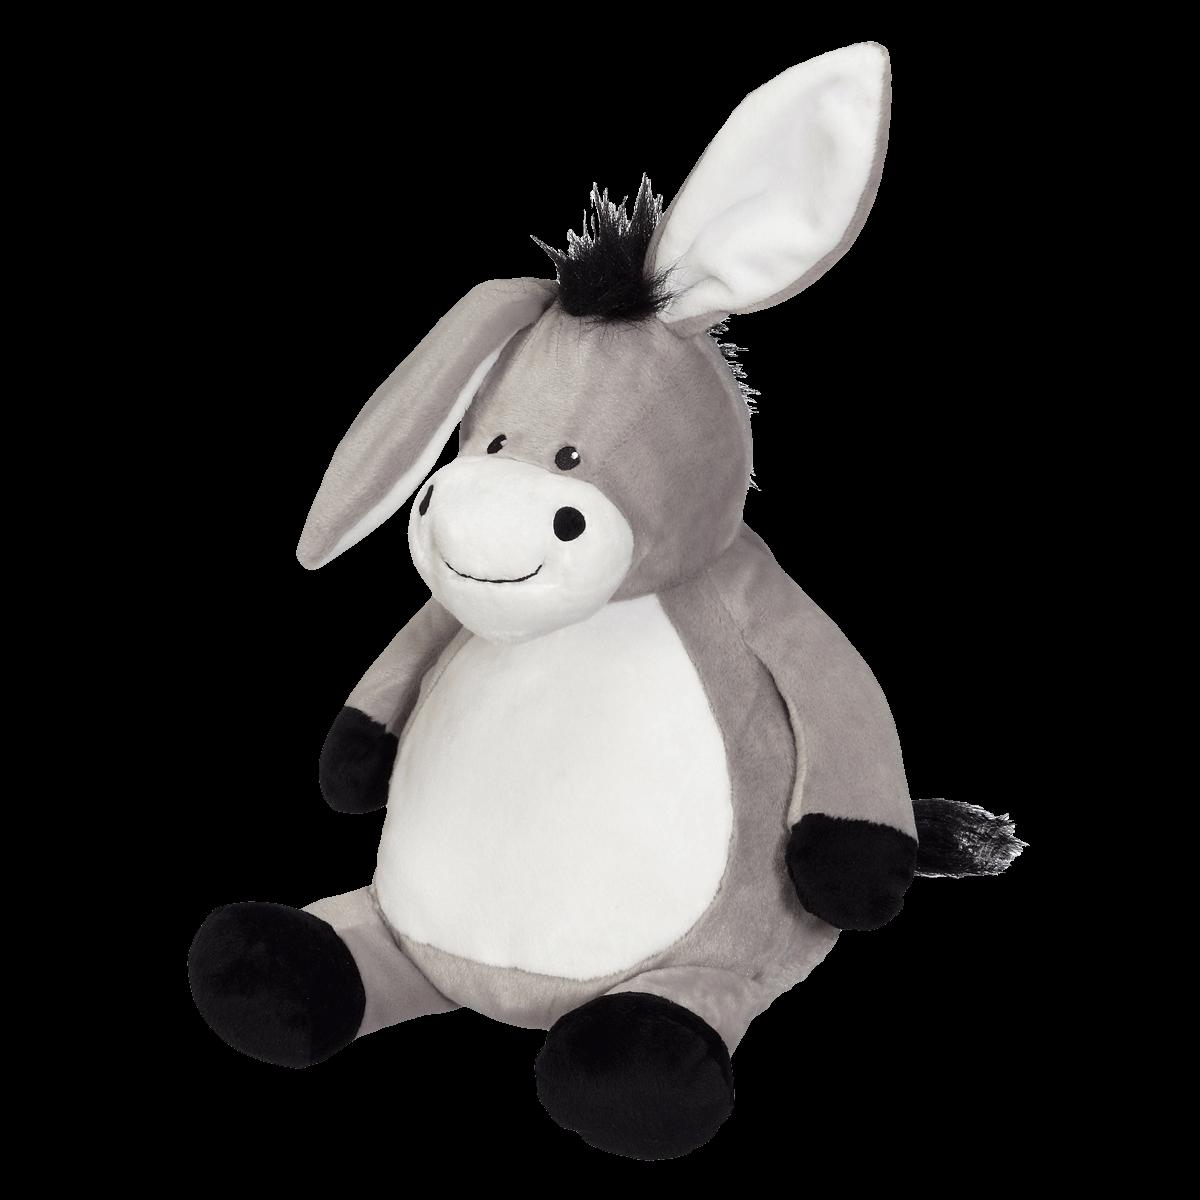 Dunkan Donkey Buddy